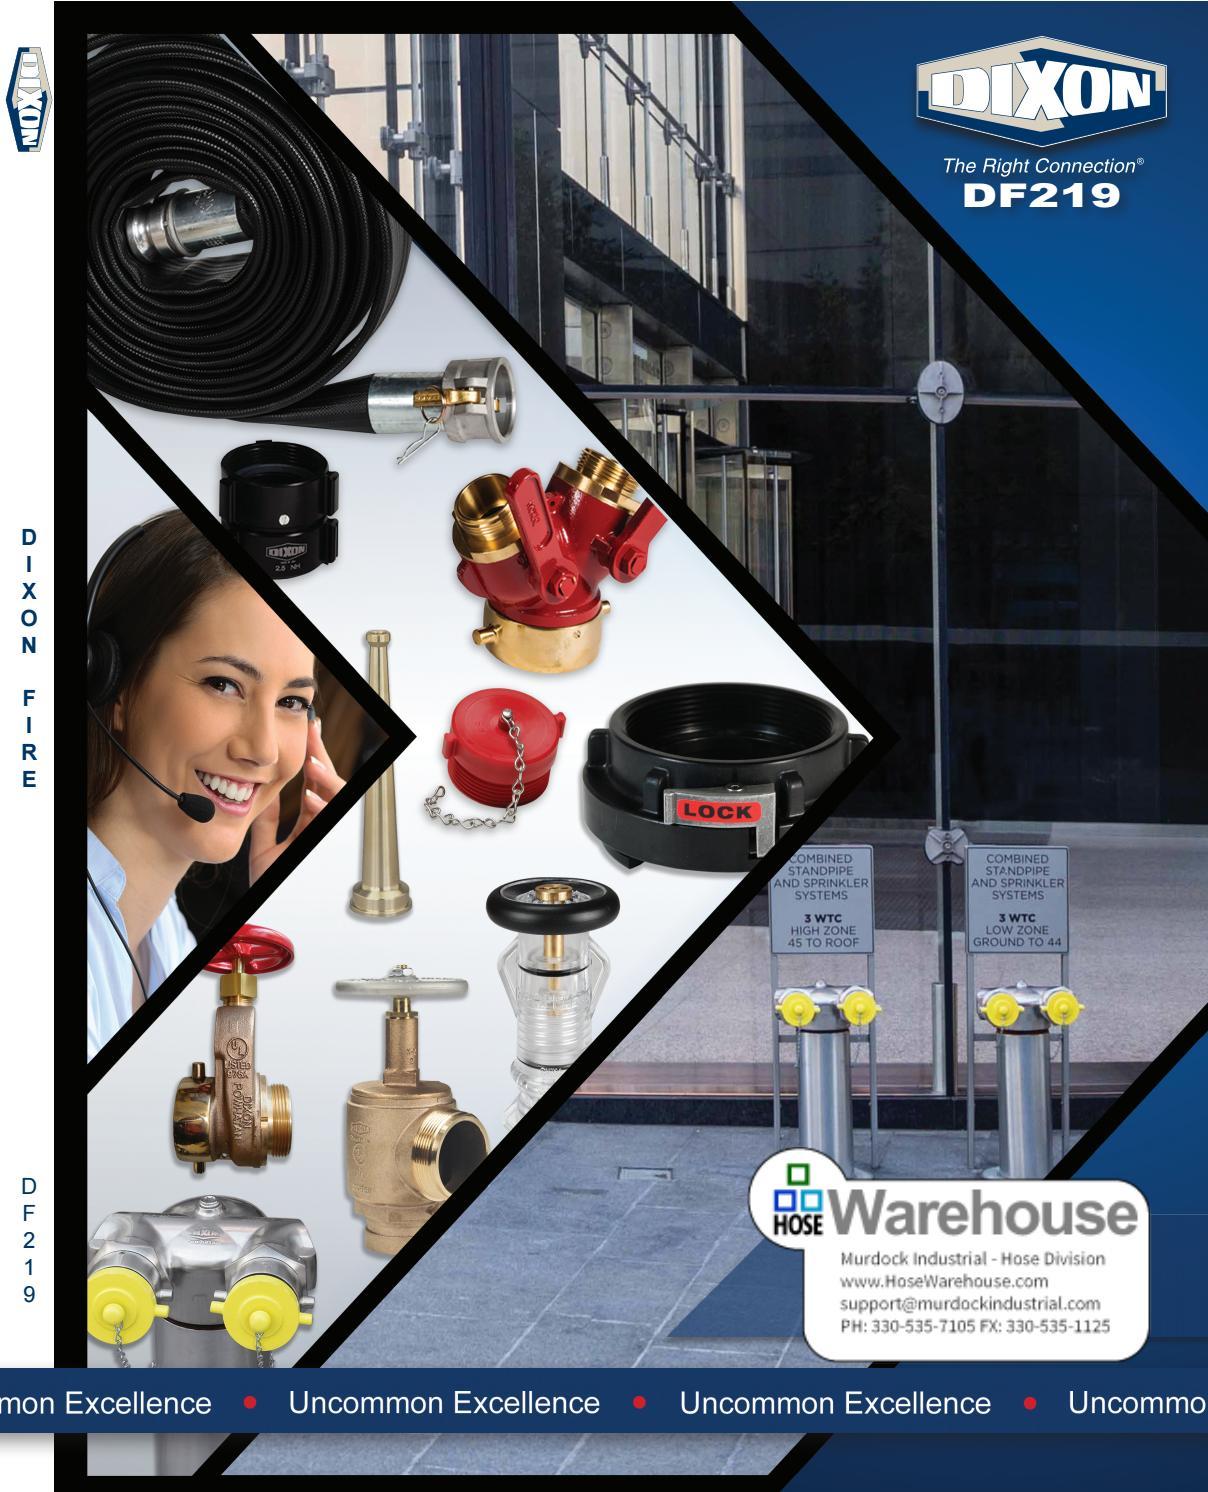 NPSH Hydrant Adapter Rocker Lug Brass 1 NPSH Dixon Valve RHA15S10 Pack of 5 pcs